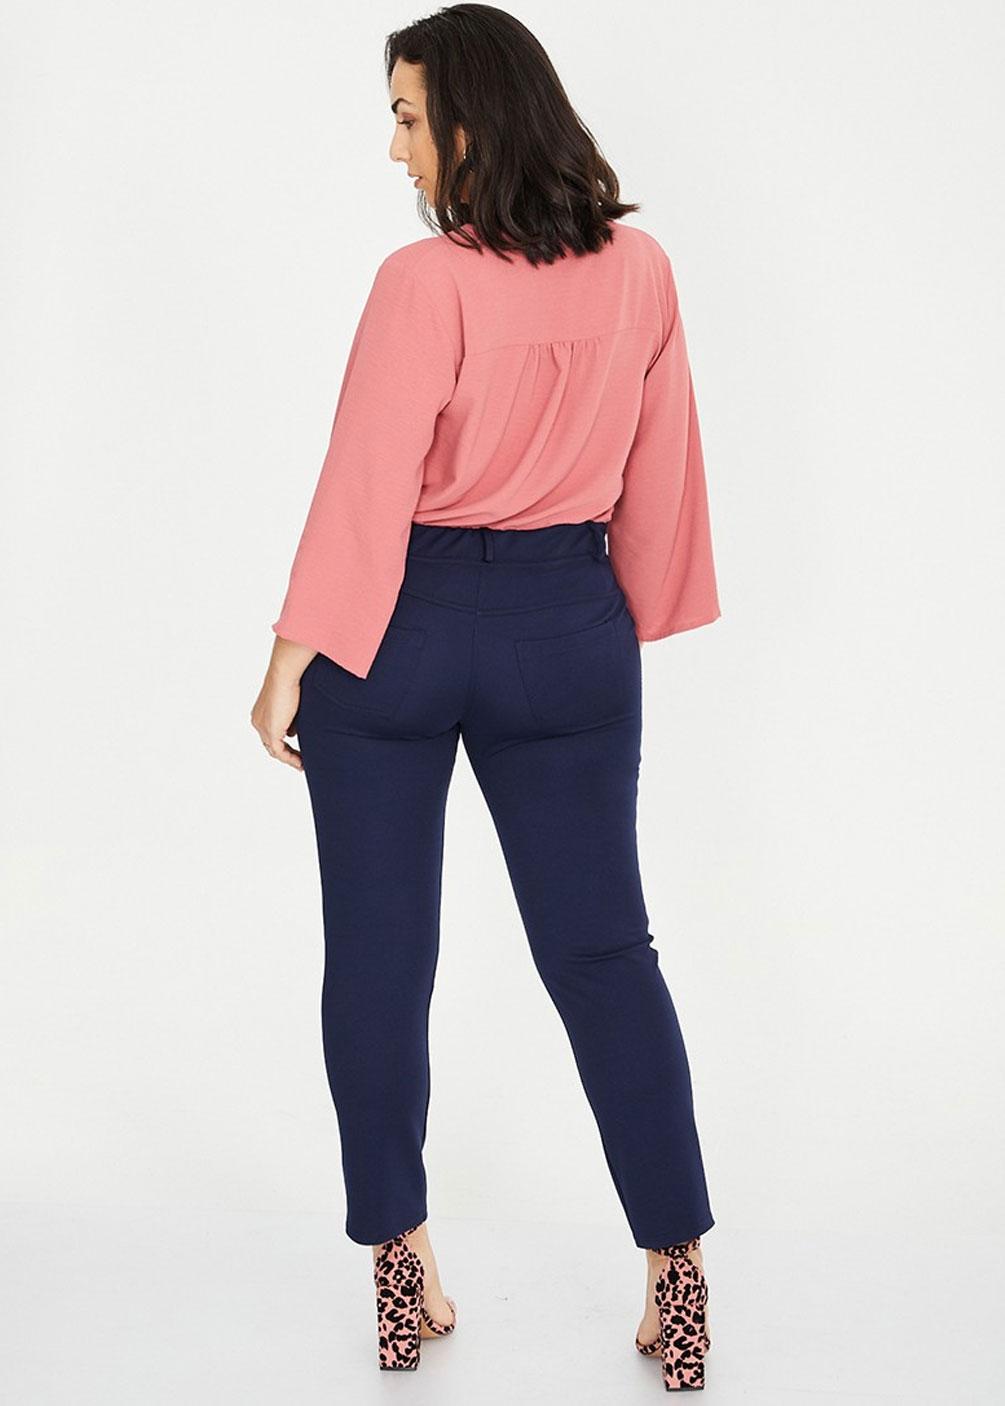 pantalon verano tallas grandes marca spg